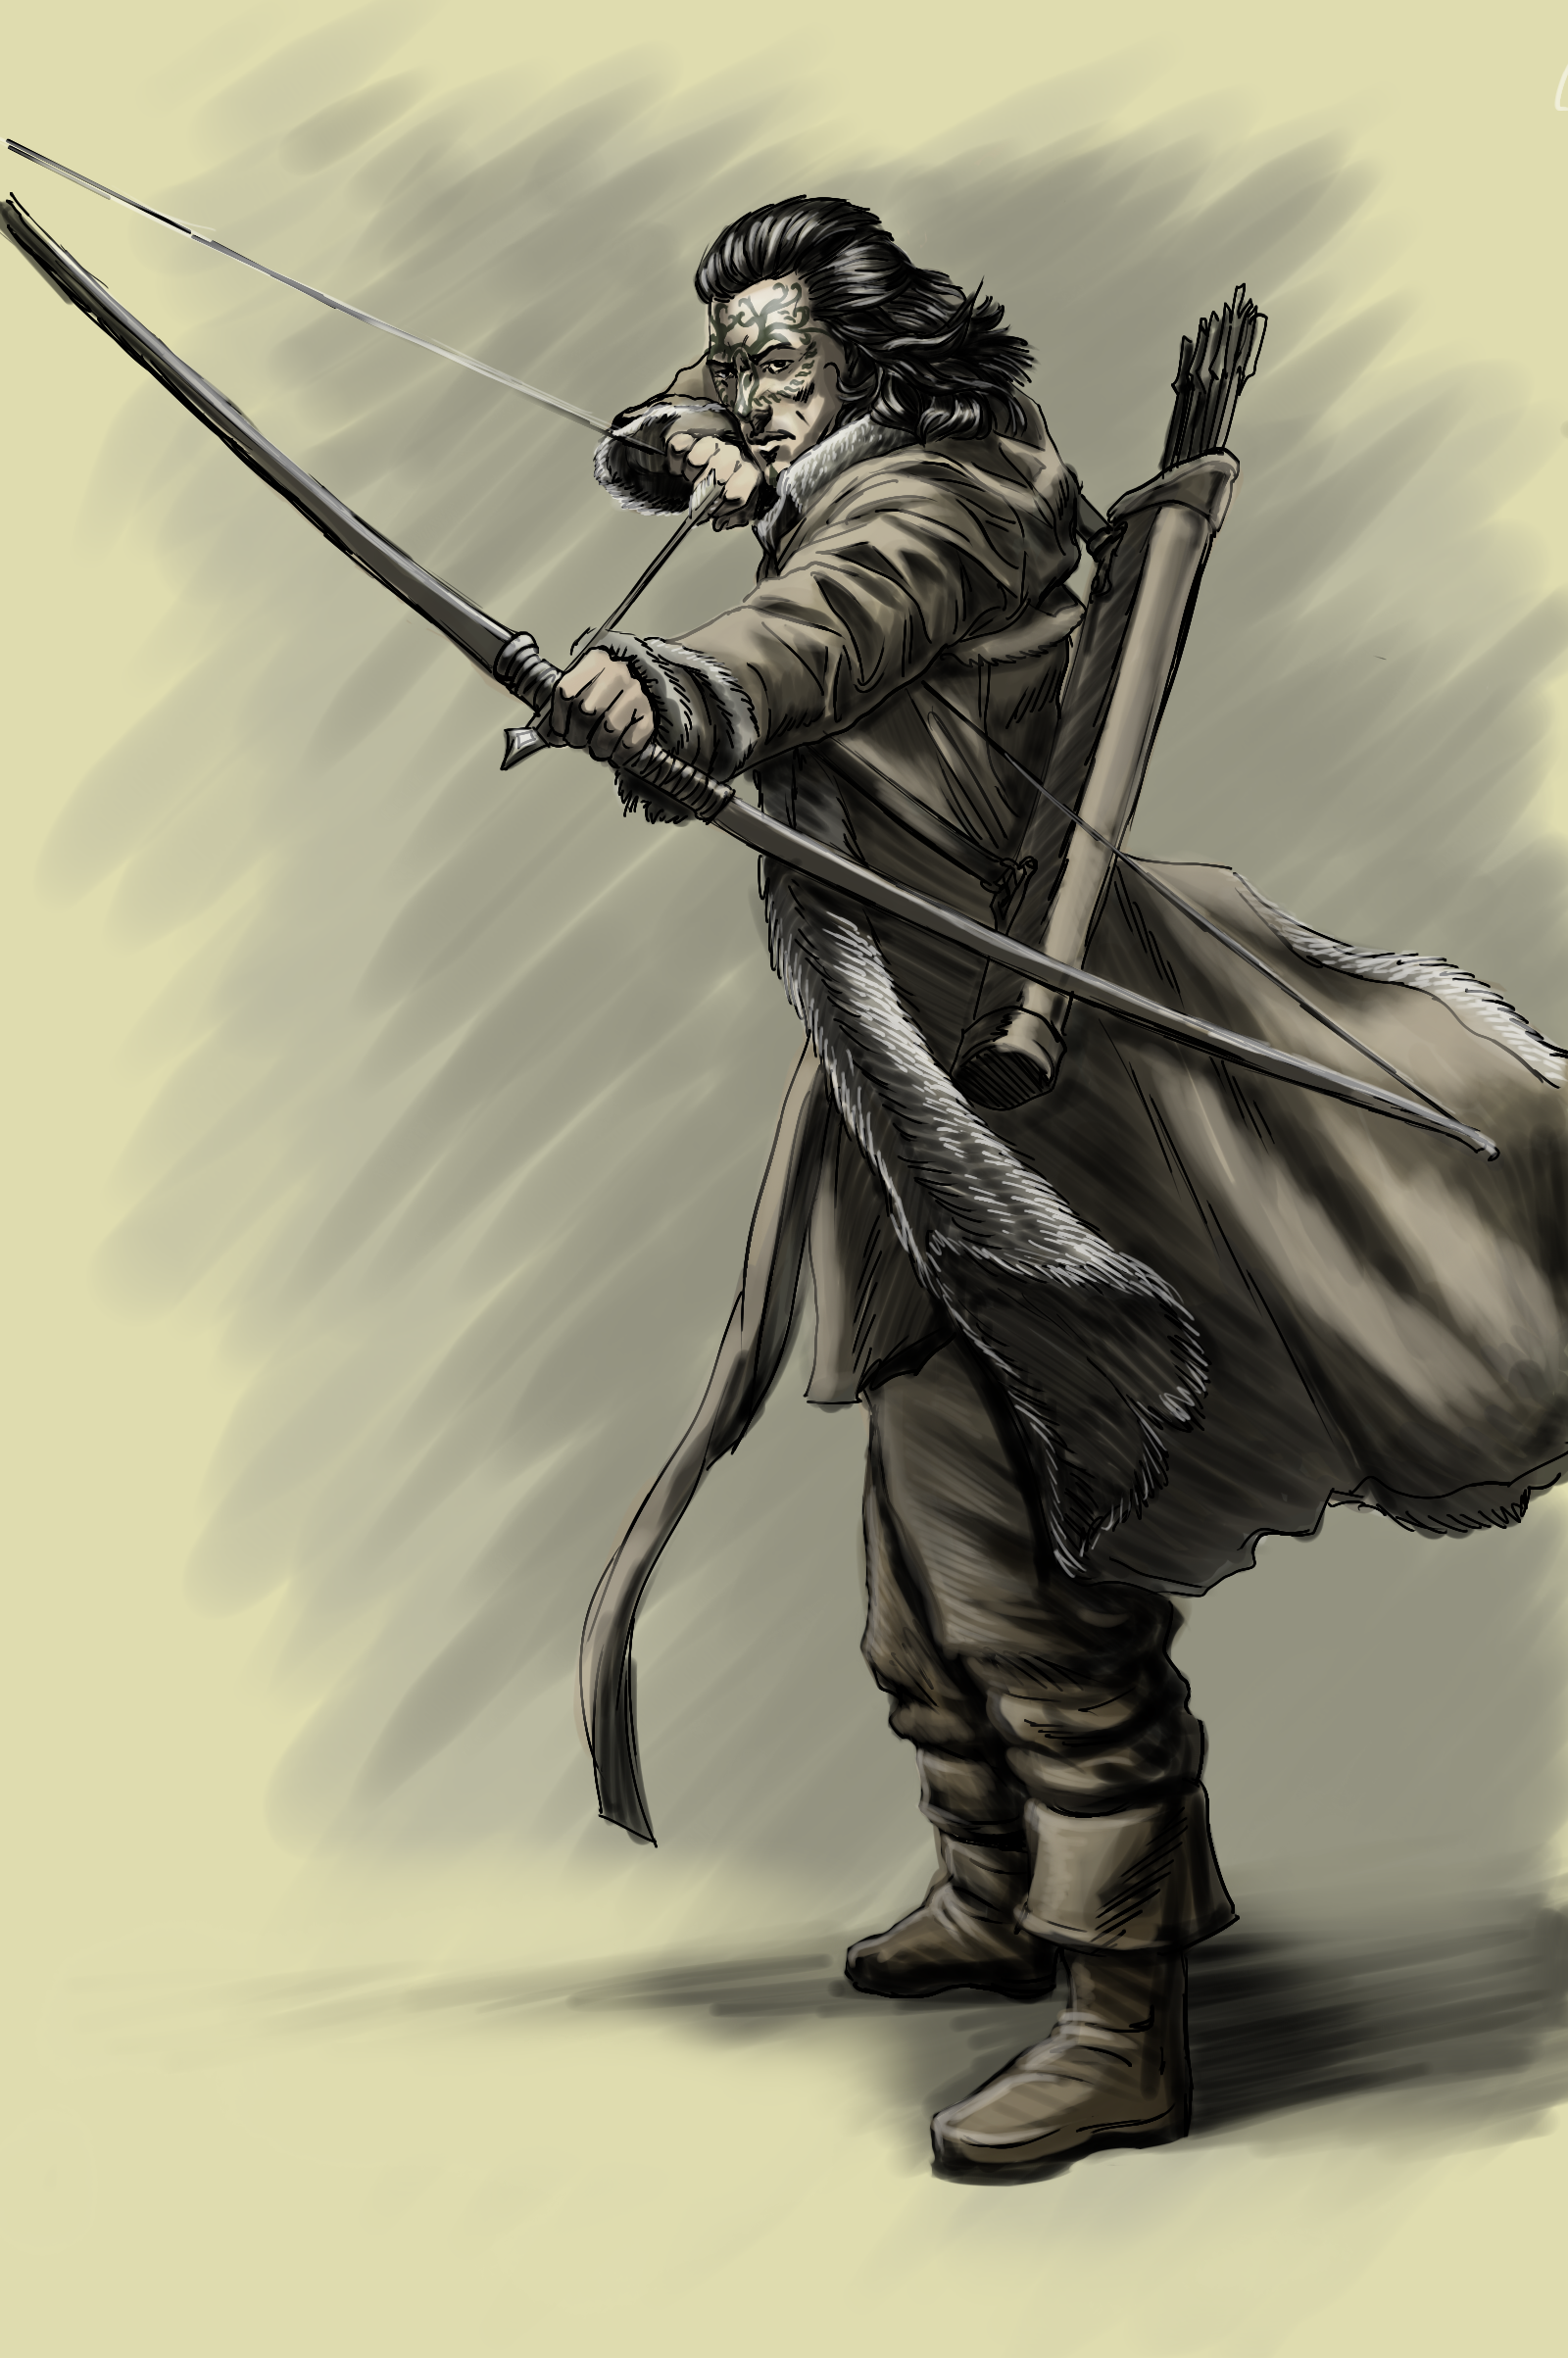 Elven archer by SOLIDToM on DeviantArt